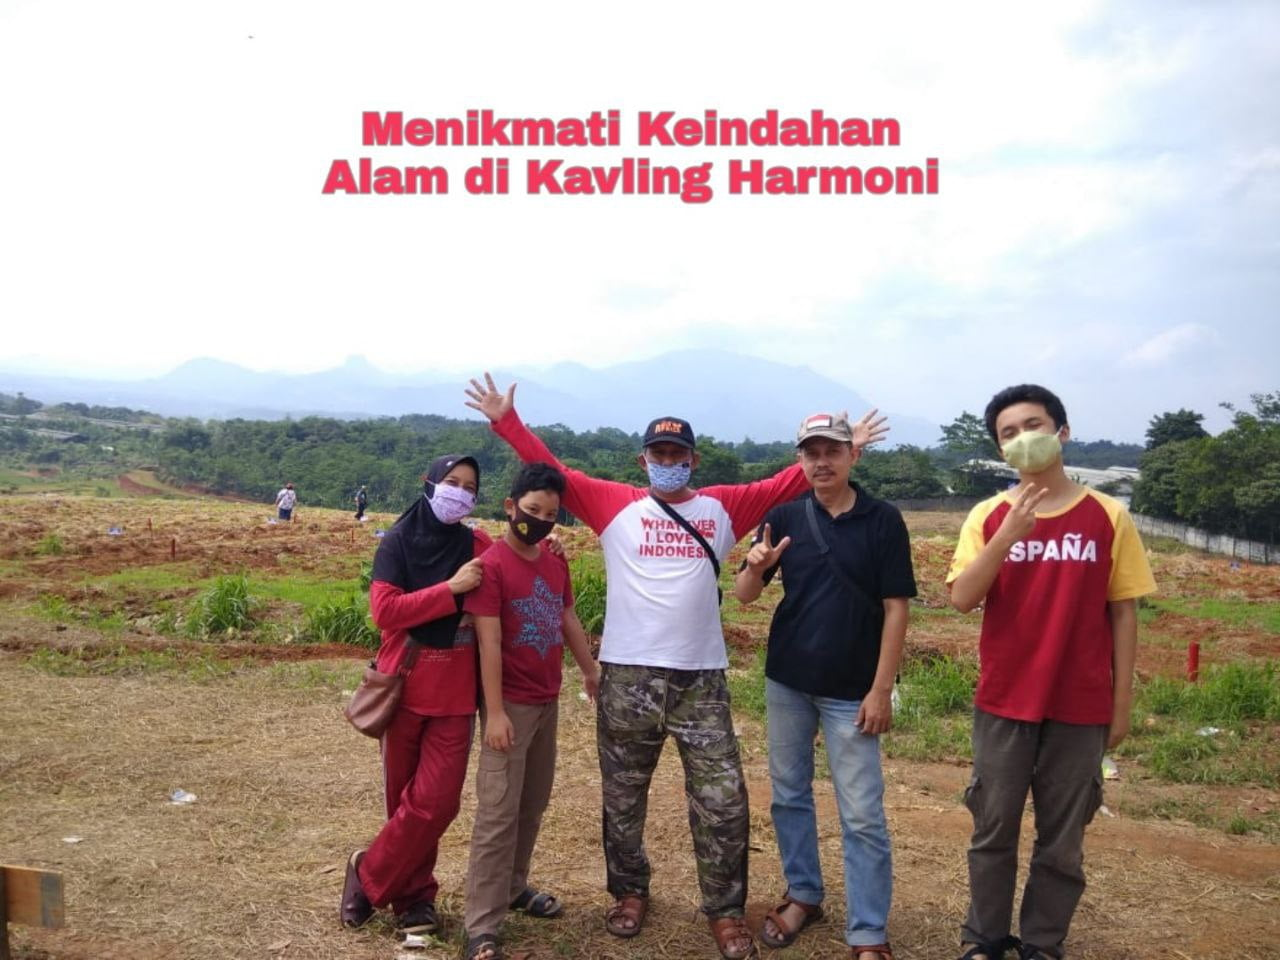 01-Galeri-Kavling-Harmoni-Alam-3.jpg